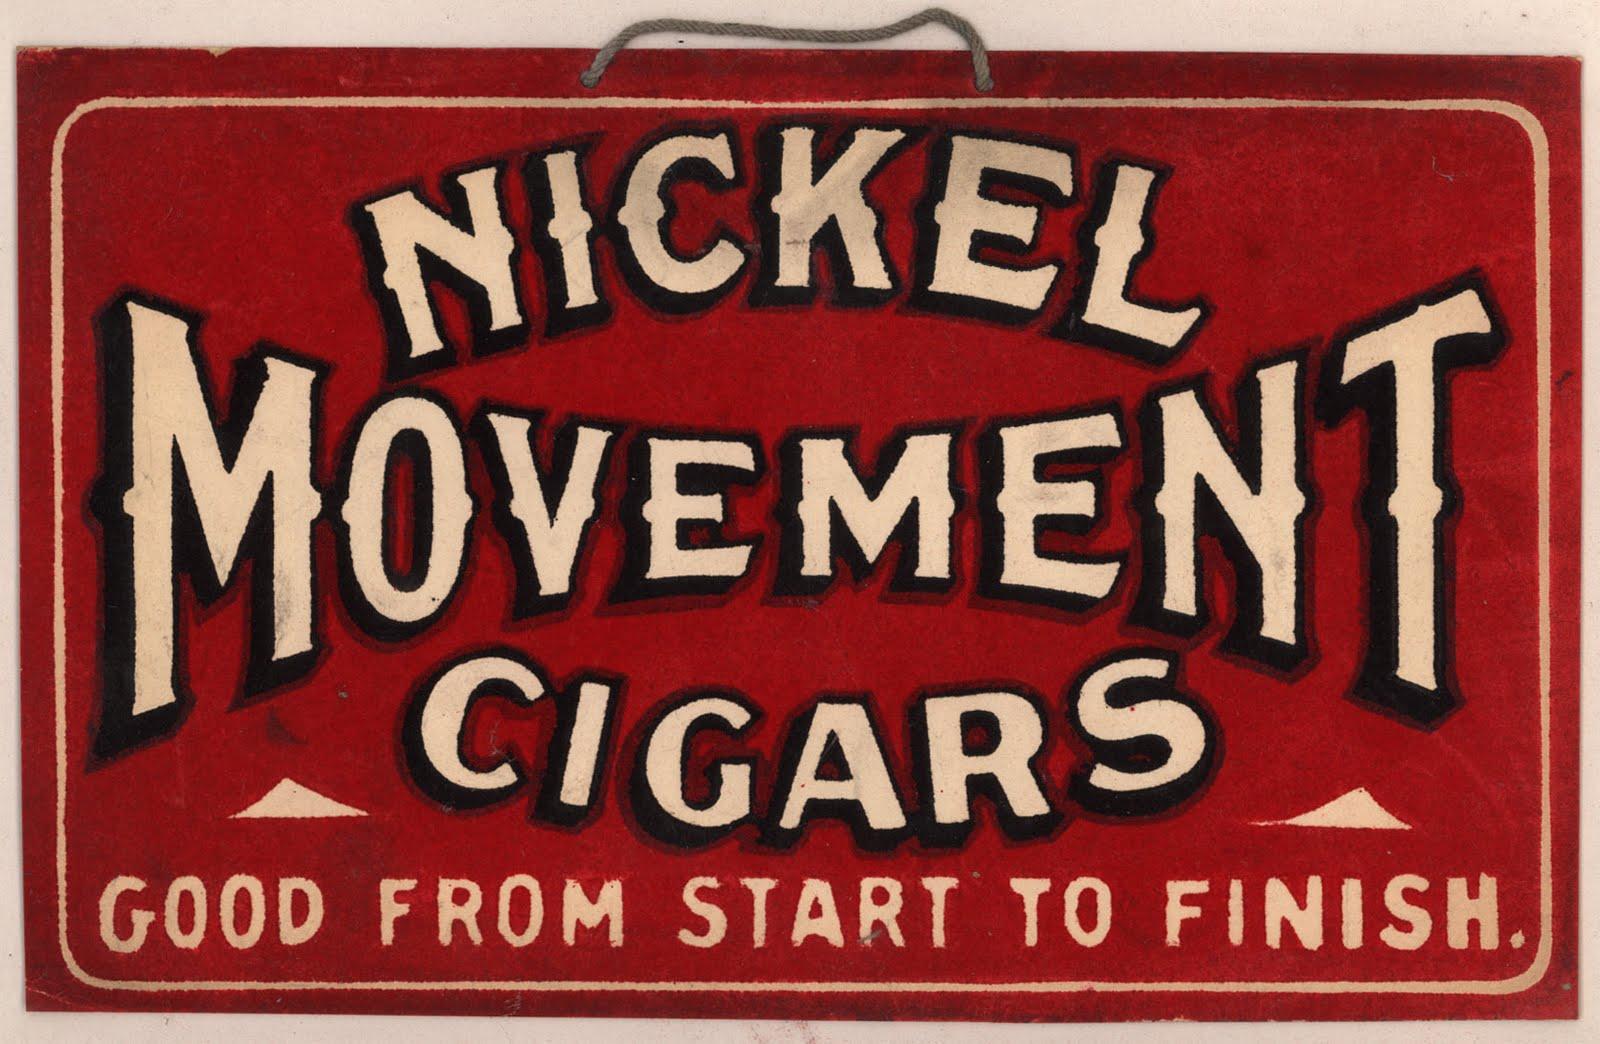 Good unfiltered cigarettes Marlboro